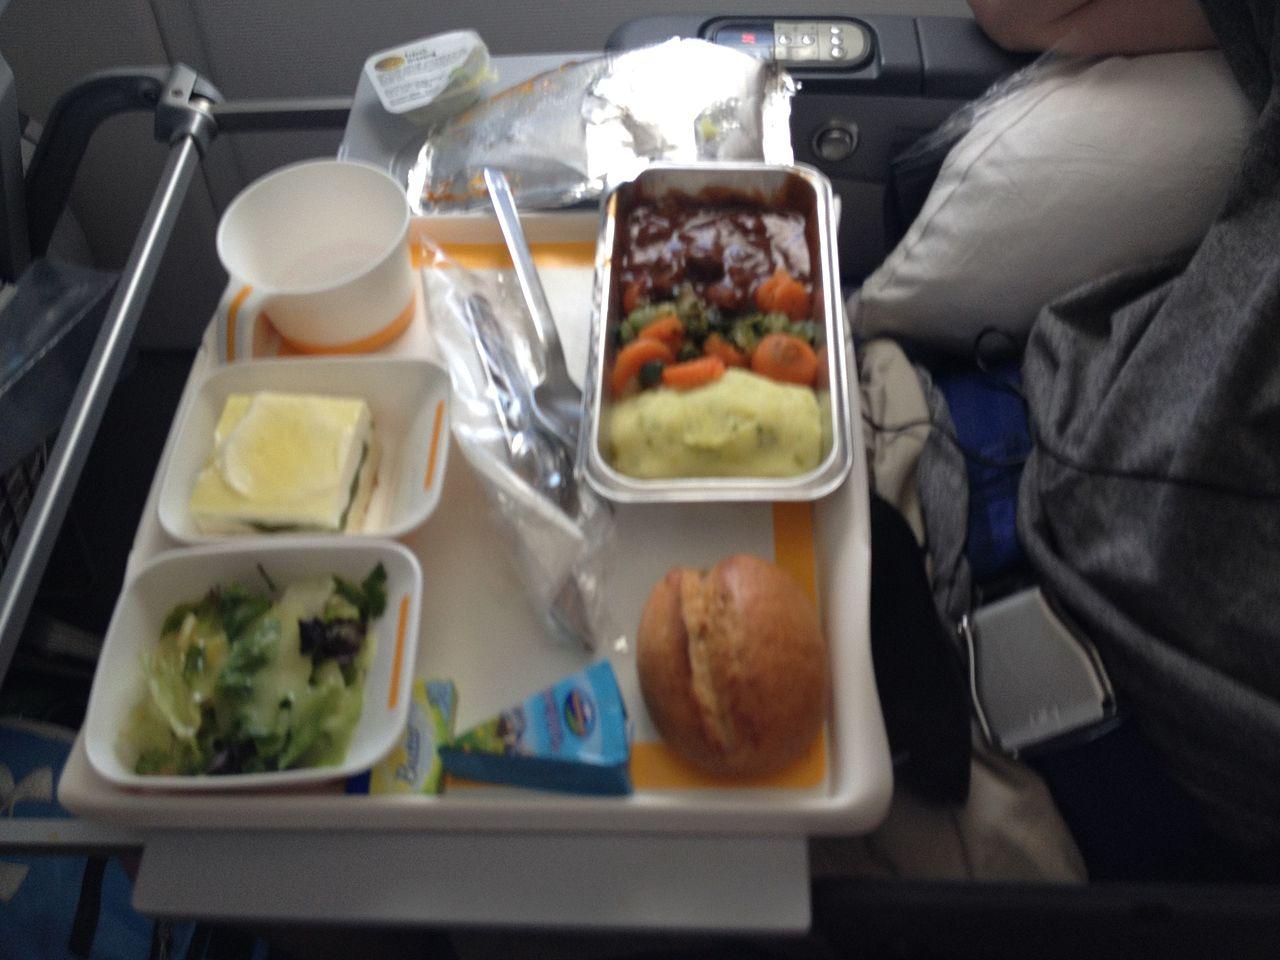 File:Lufthansa Economy Class Food.jpg - Wikimedia Commons